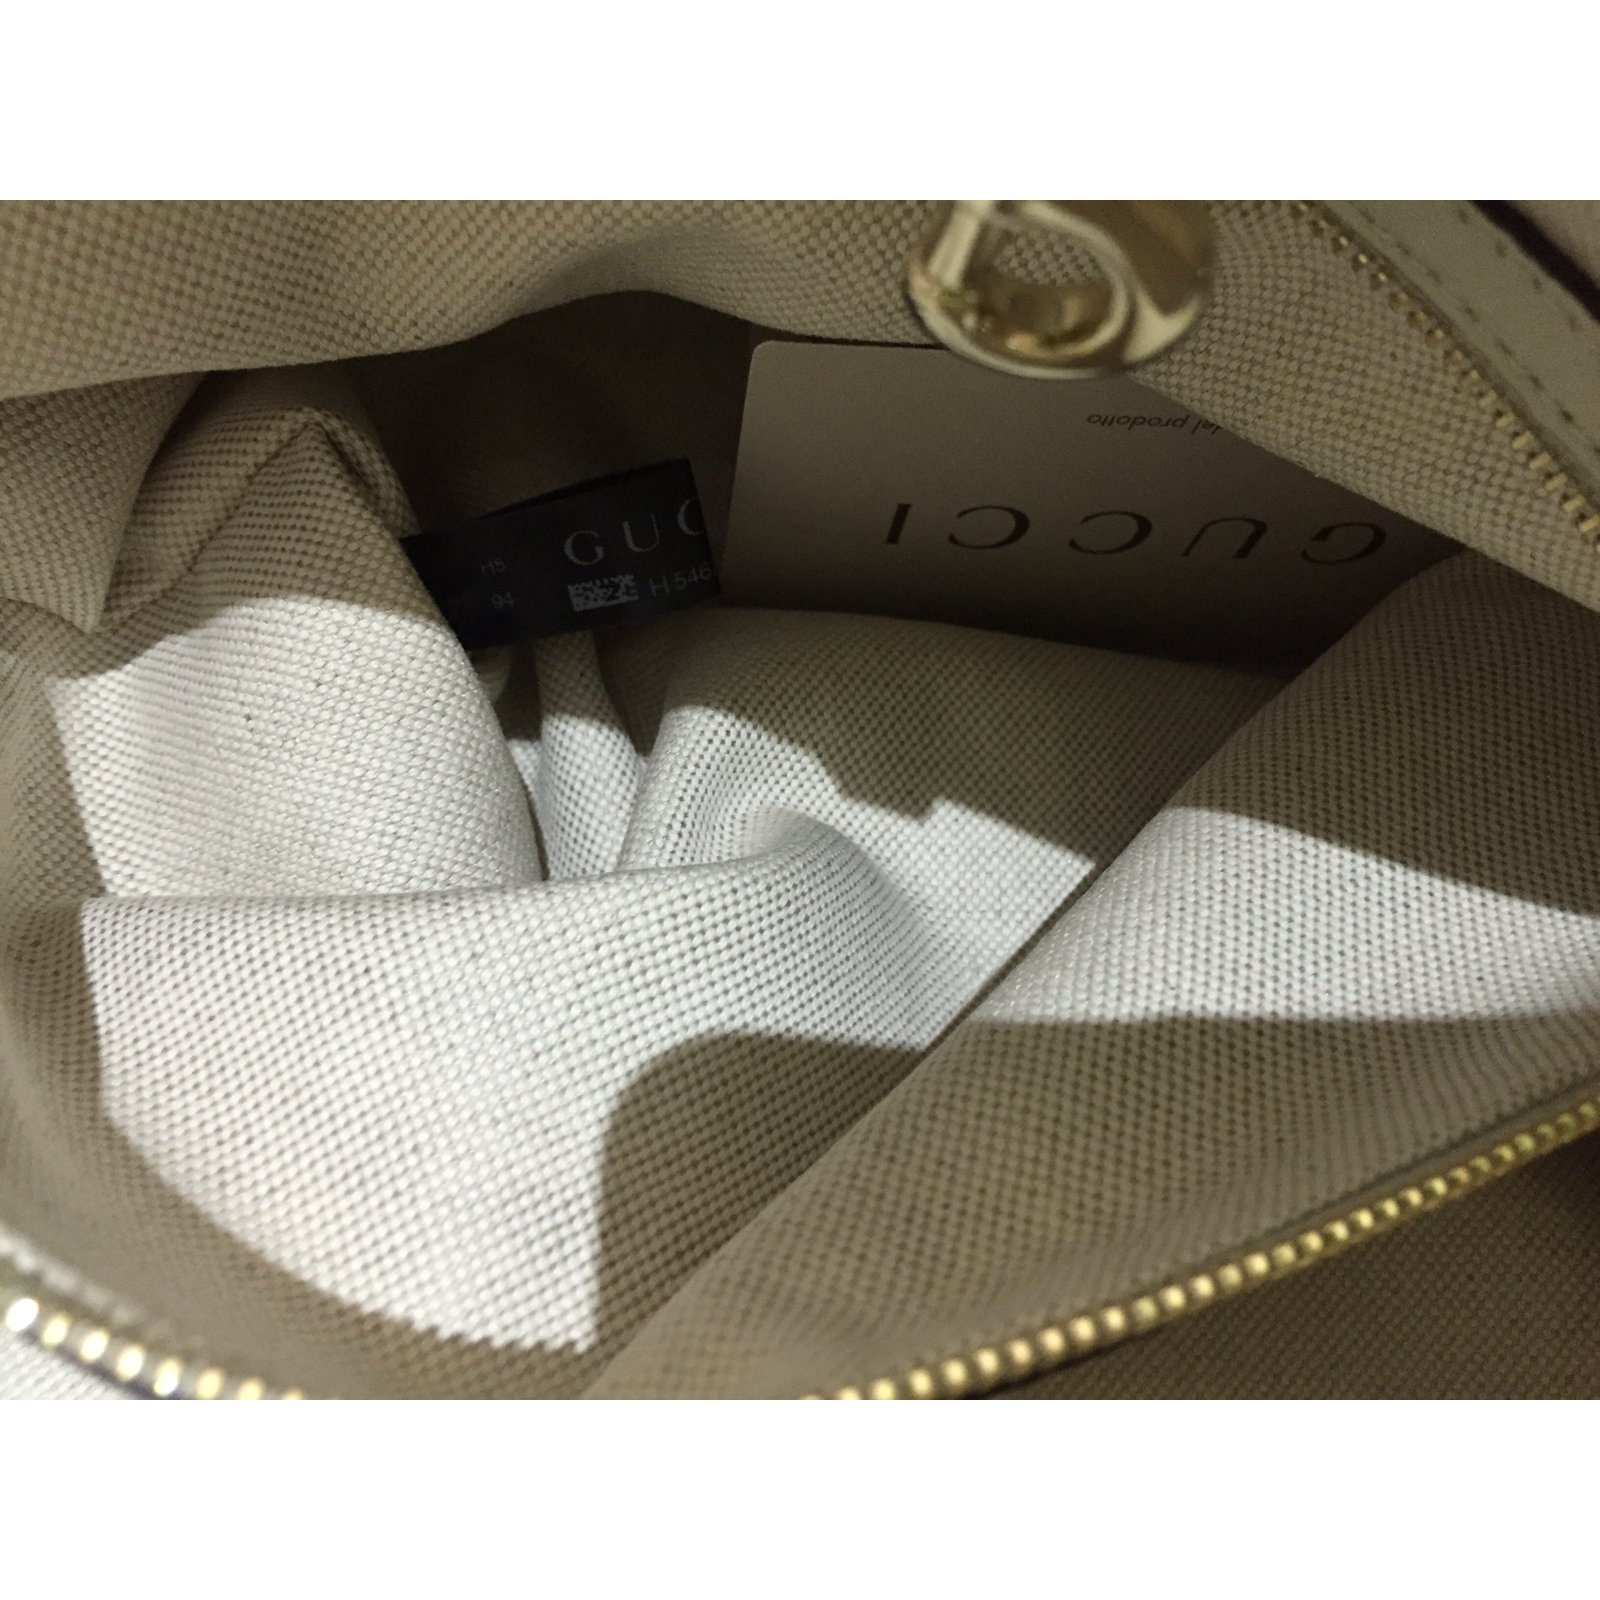 8392228c505c Gucci Soho Gucci chain bag Handbags Leather Black ref.19270 - Joli Closet